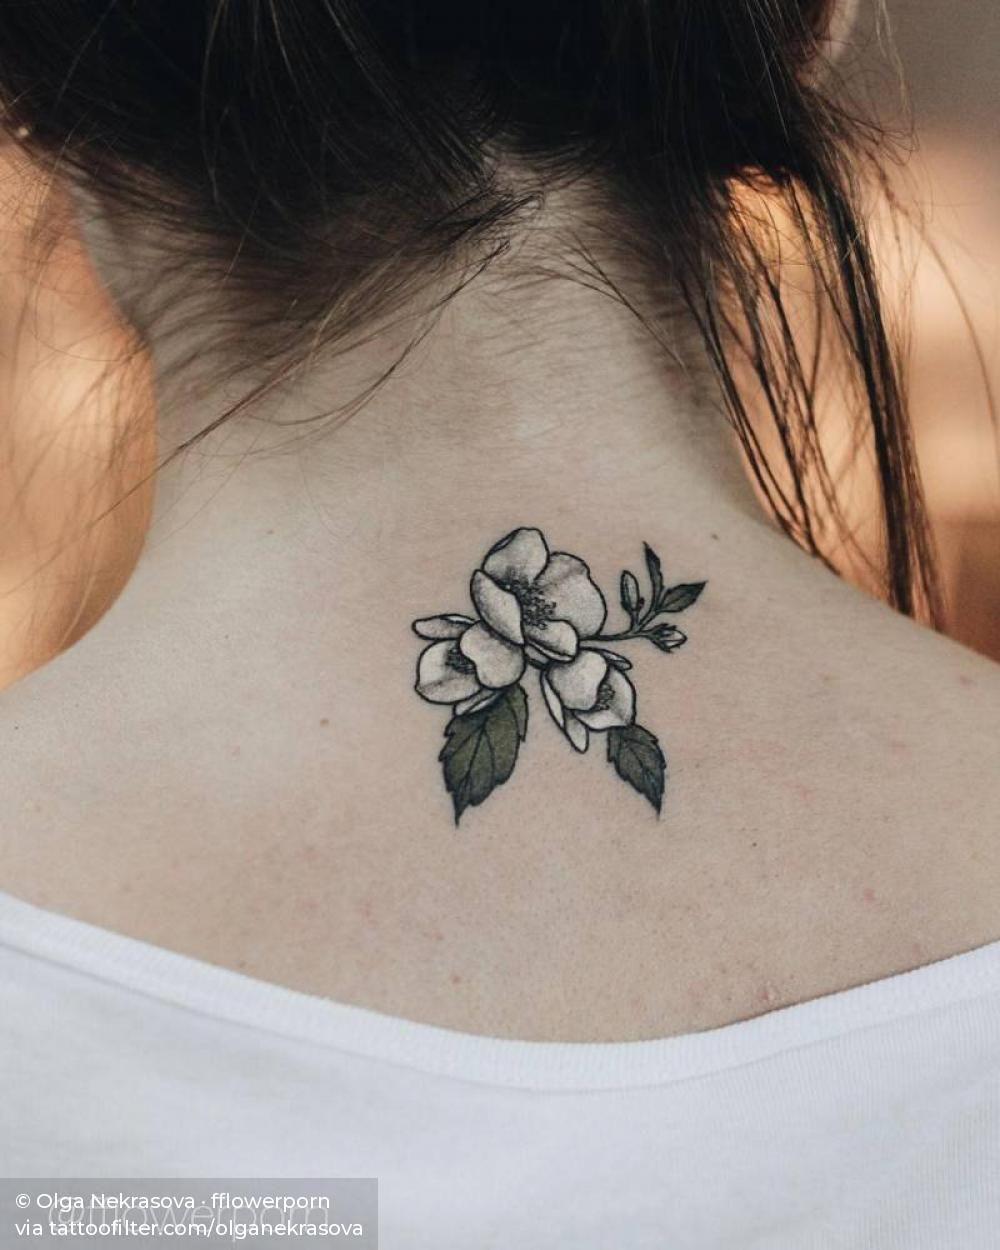 Jasmine Tattoo On The Back Of The Neck Tatoeage Ideeen Tatoeage Kleine Tatoeage Ontwerpen